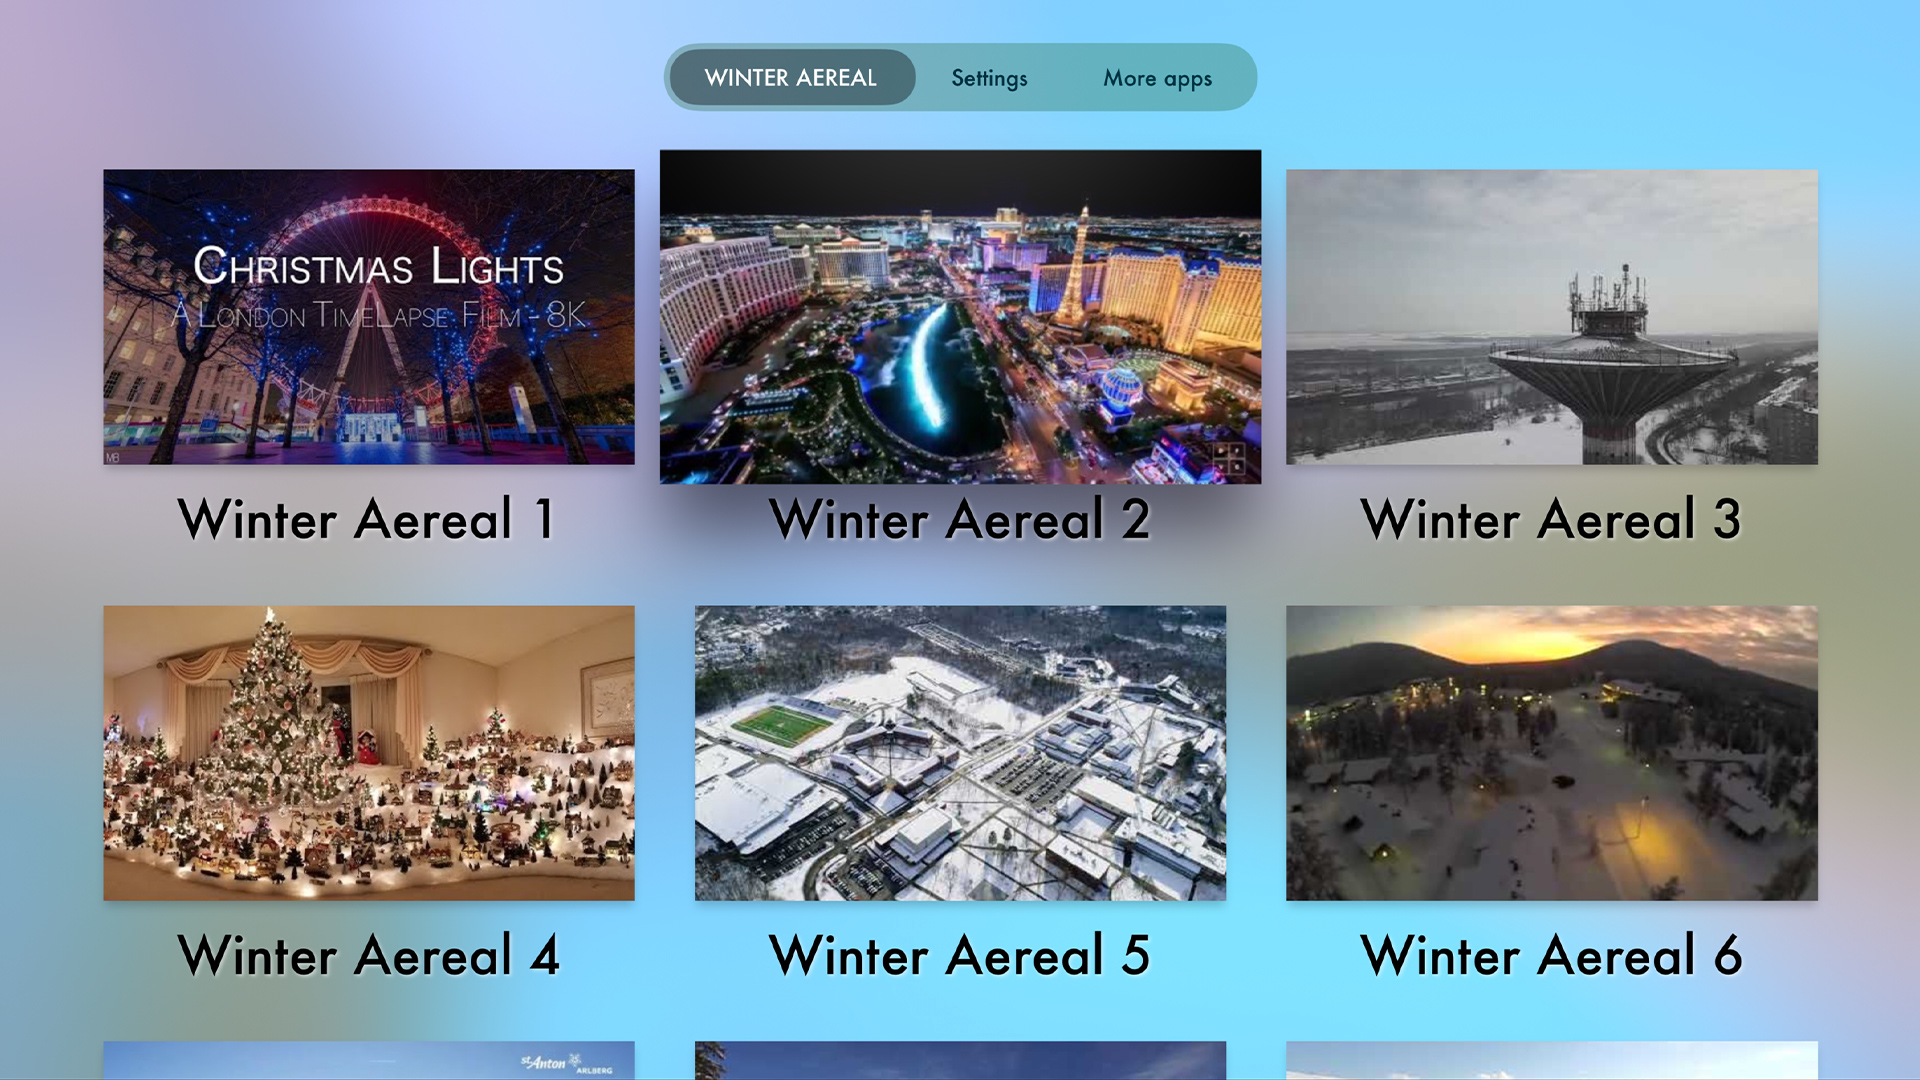 Winter Aereal screenshot 1